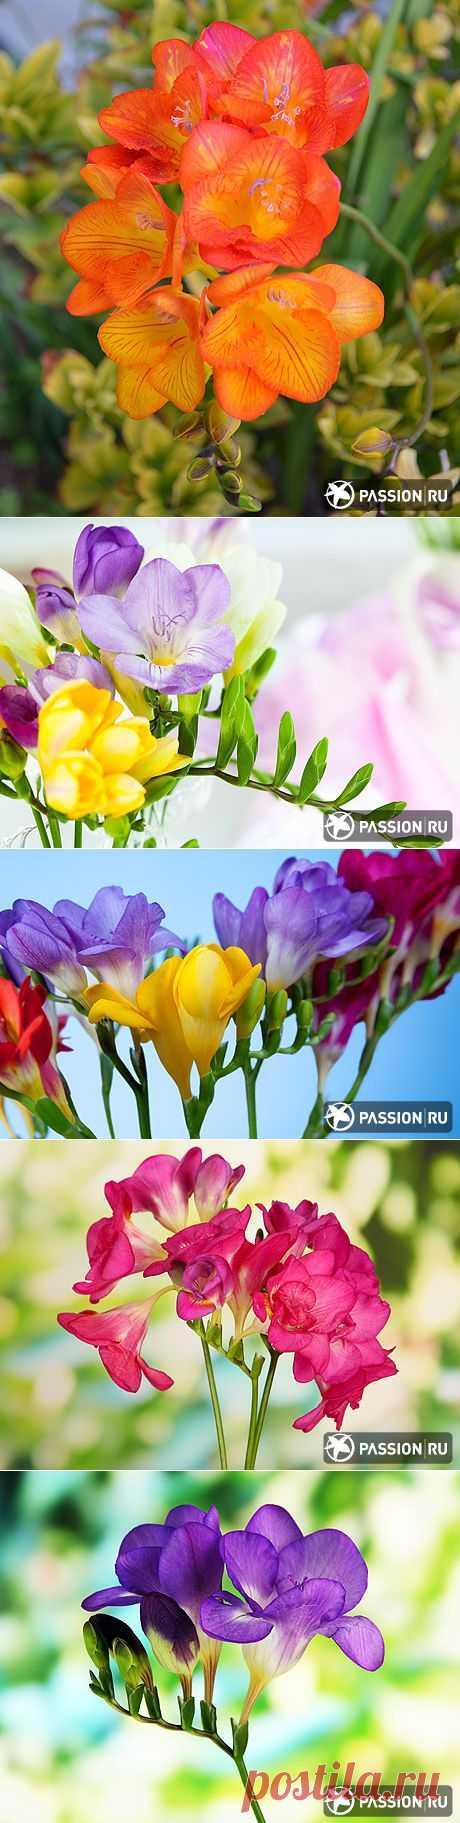 Flower - the Freesia!